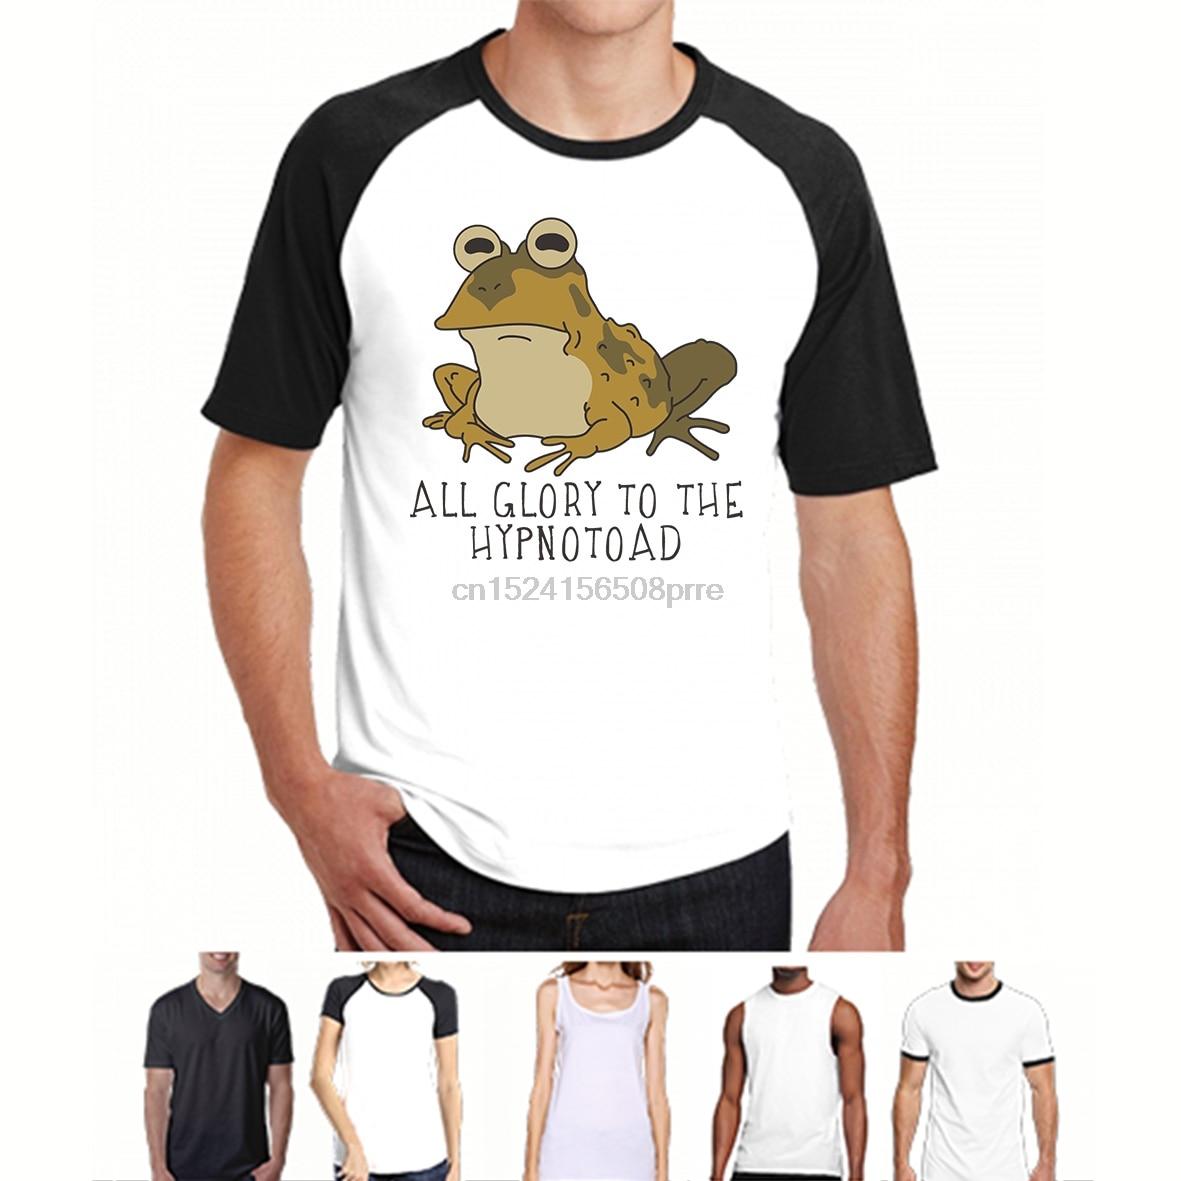 100% Cotton O-neck Custom Printed Tshirt Men T Shirt Hypnotoad - Hypnotoad Women T-shirt Superior Materials